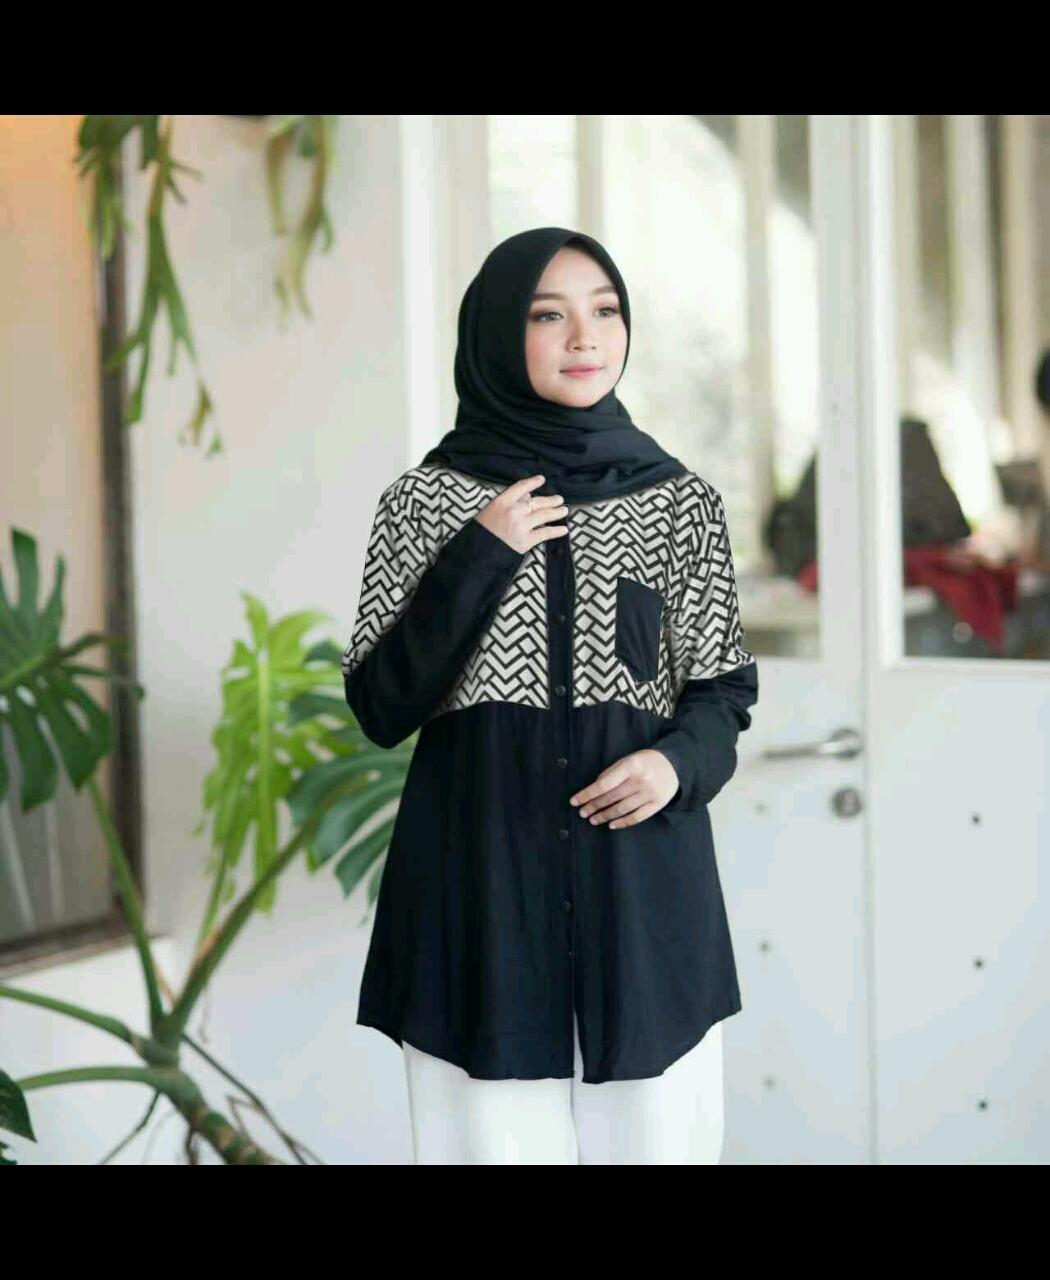 LT Kemeja Tunik Zigzag Katun Rayon Fit L LD 95 No Pashmina Blus kekinian Kemeja Panjang Baju Lebaran